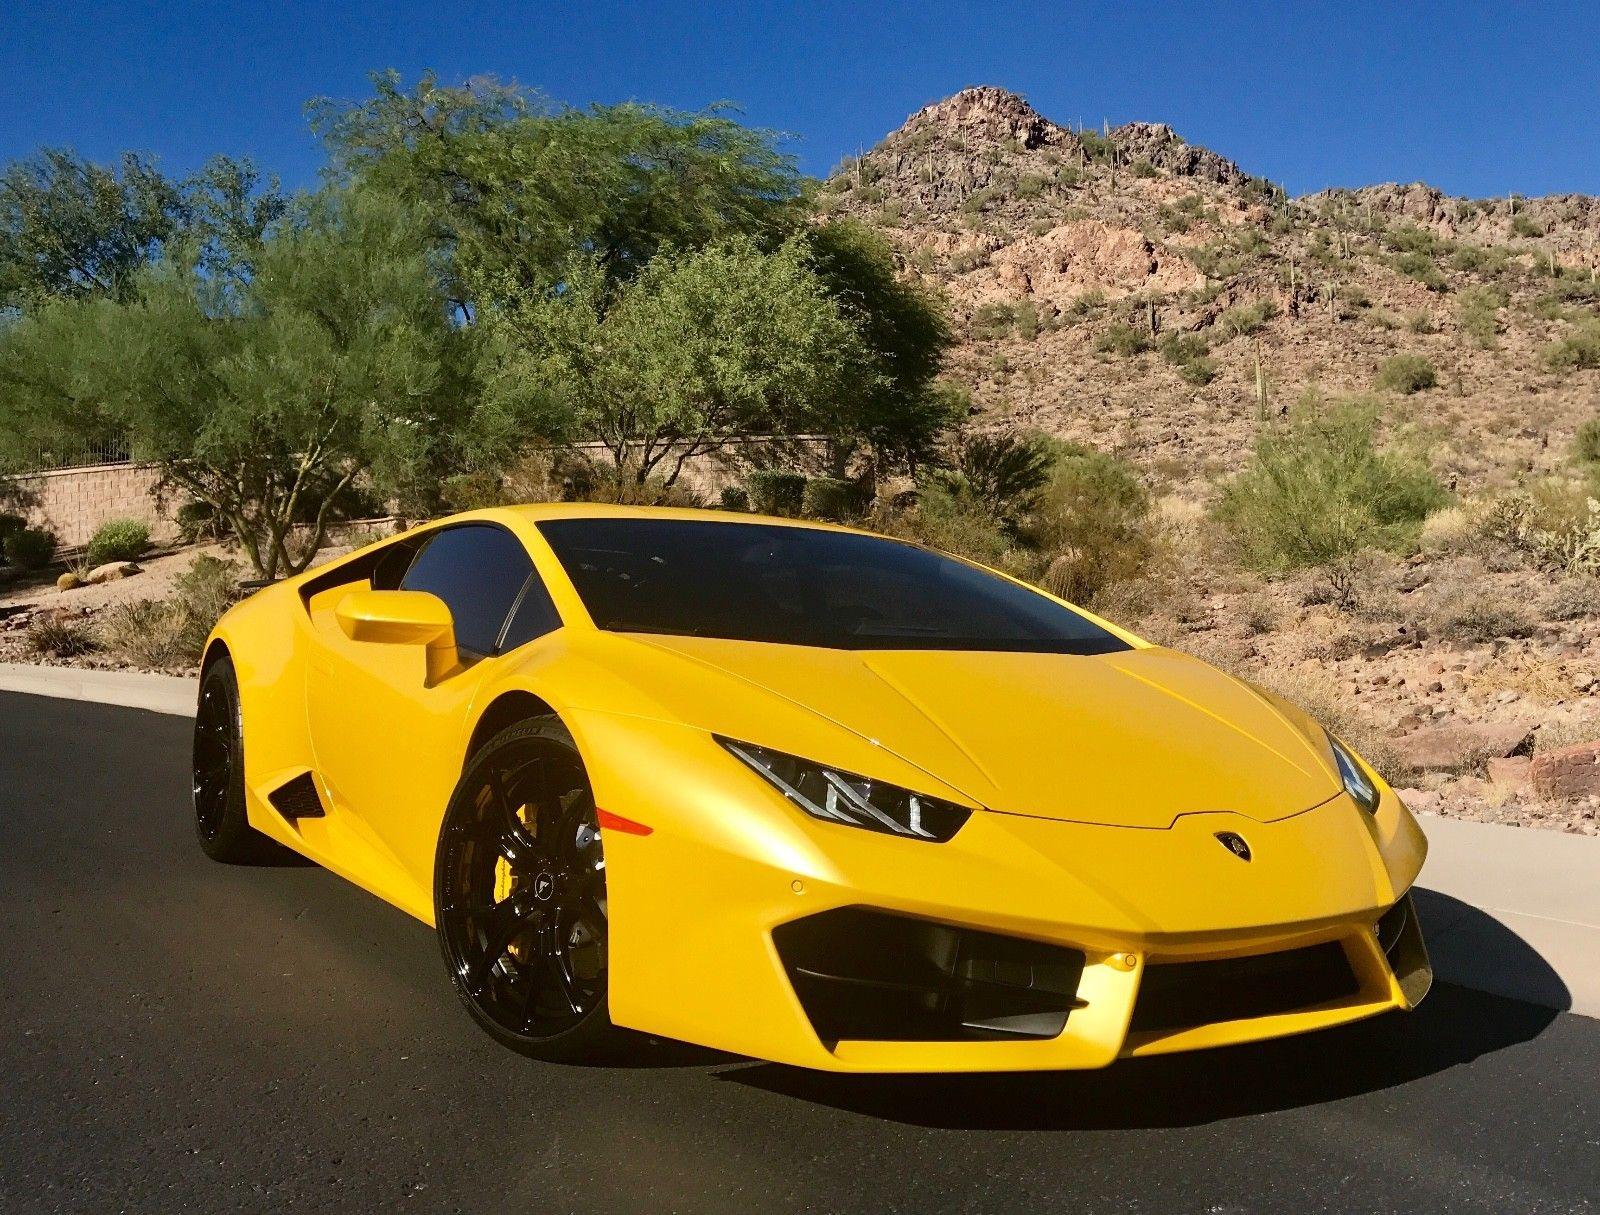 Amazing 2017 Lamborghini Huracan Rwd Coupe Vf630 2 Vorsteiner Upgrades Performante Tune 2018